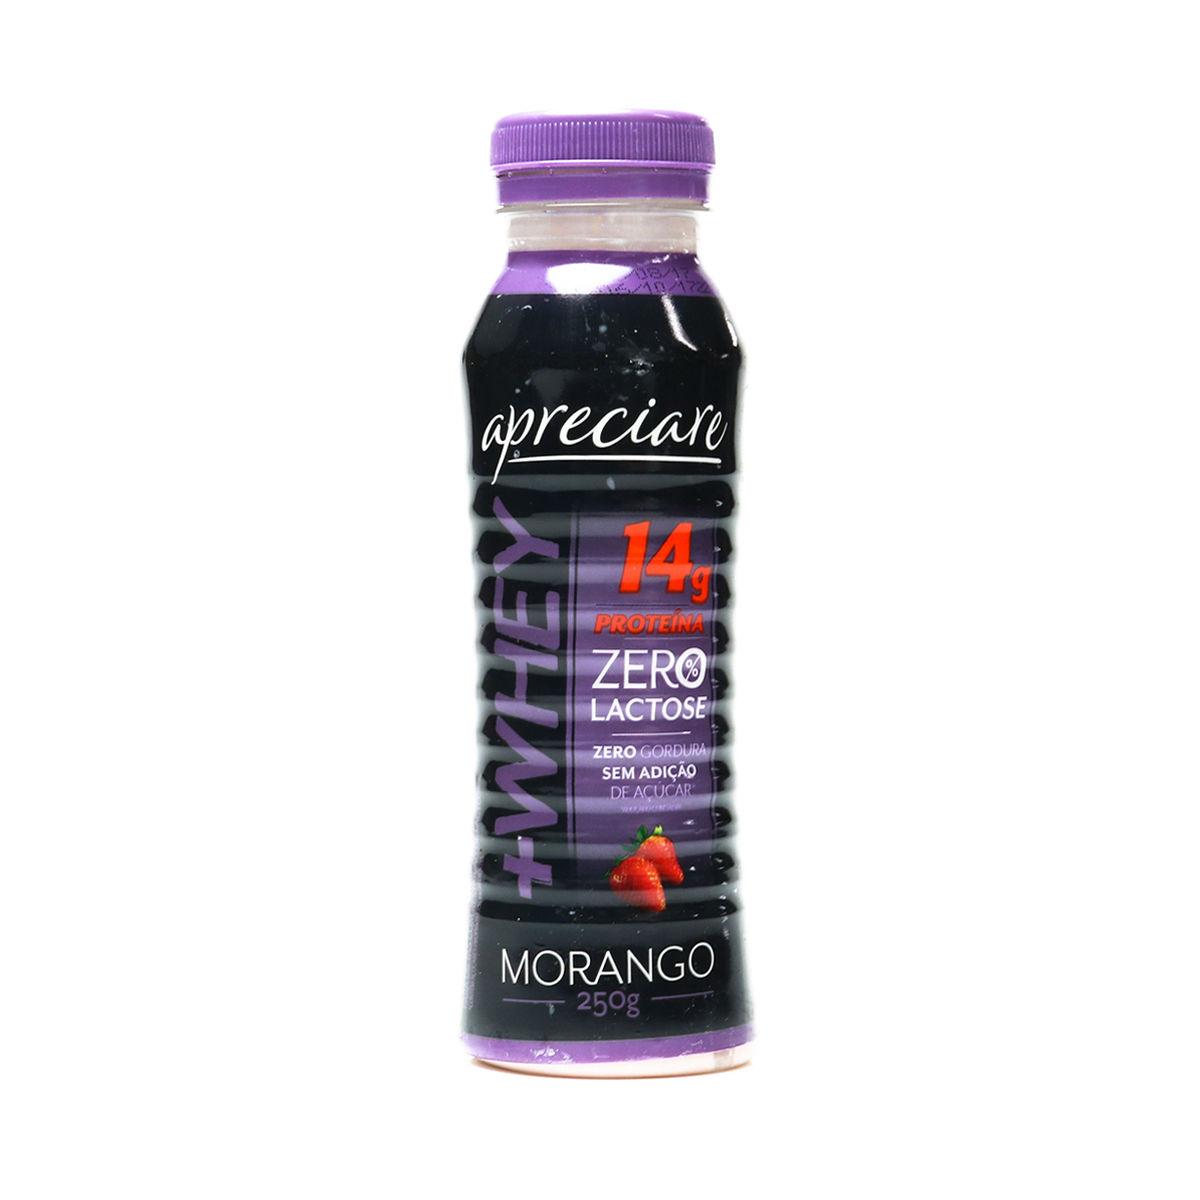 Iogurte proteinado zero lactose s/ açucar sabor morango Apreciare 250g